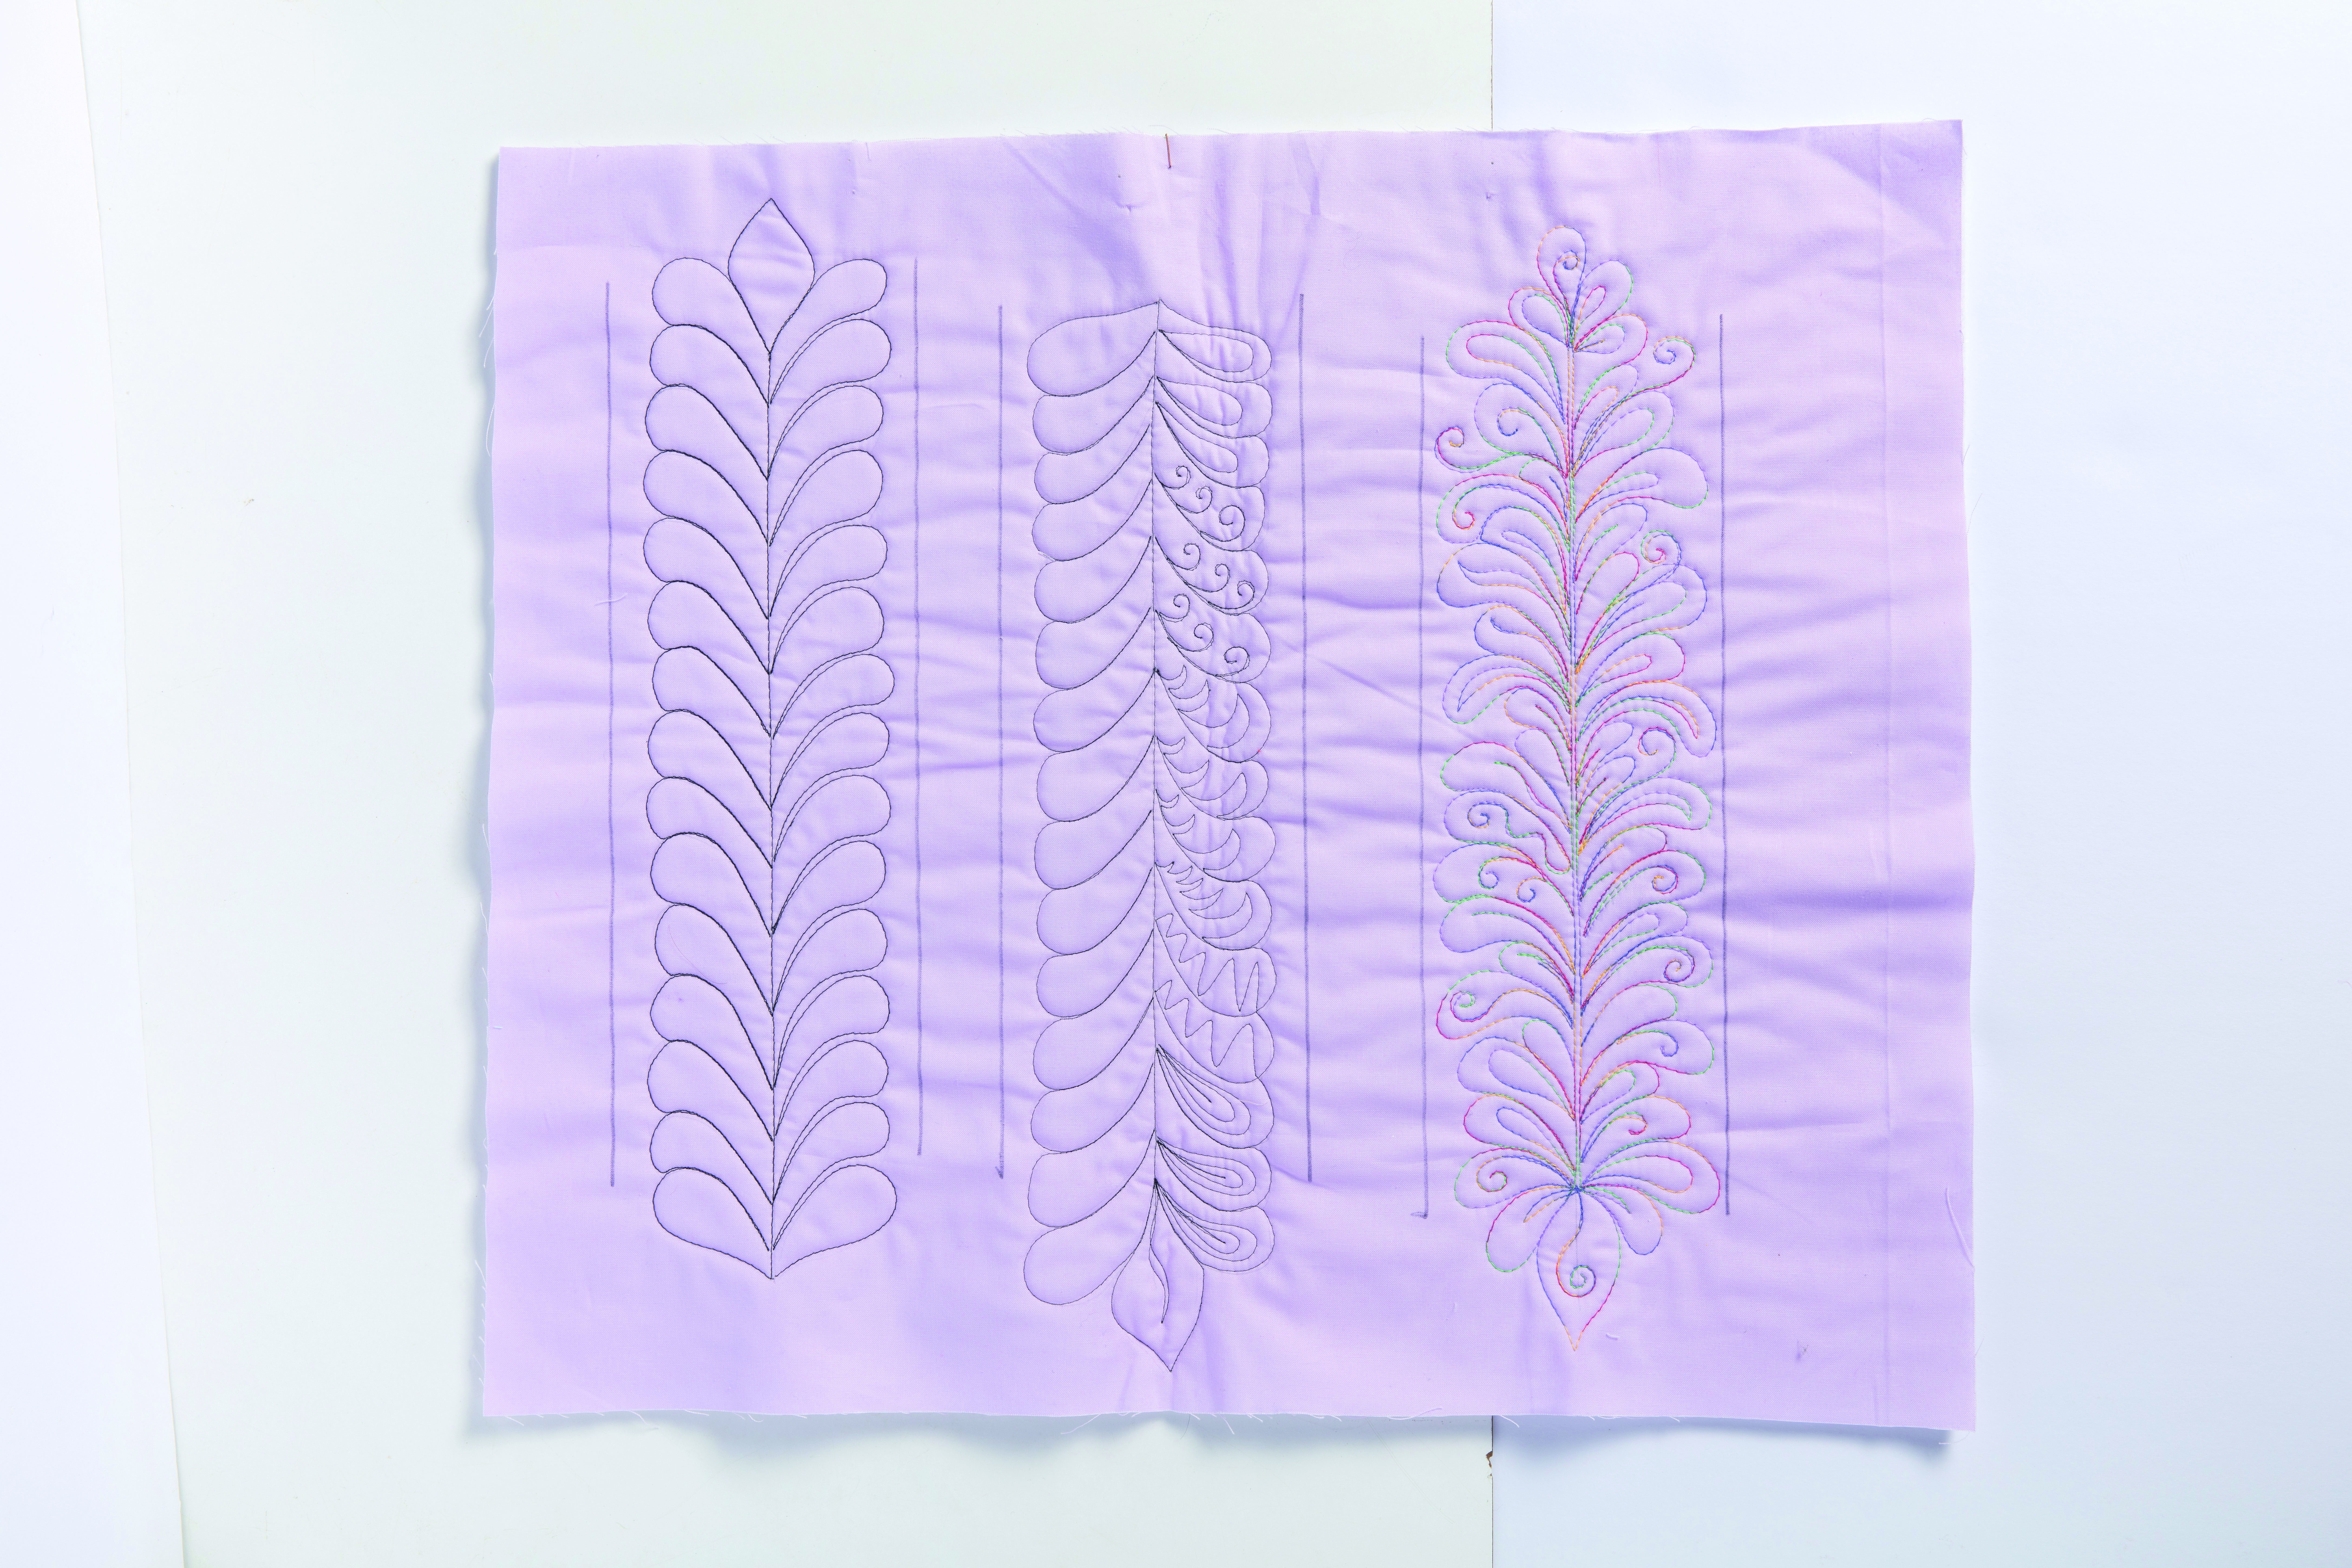 Deb Louie Stitched Samples Original Image